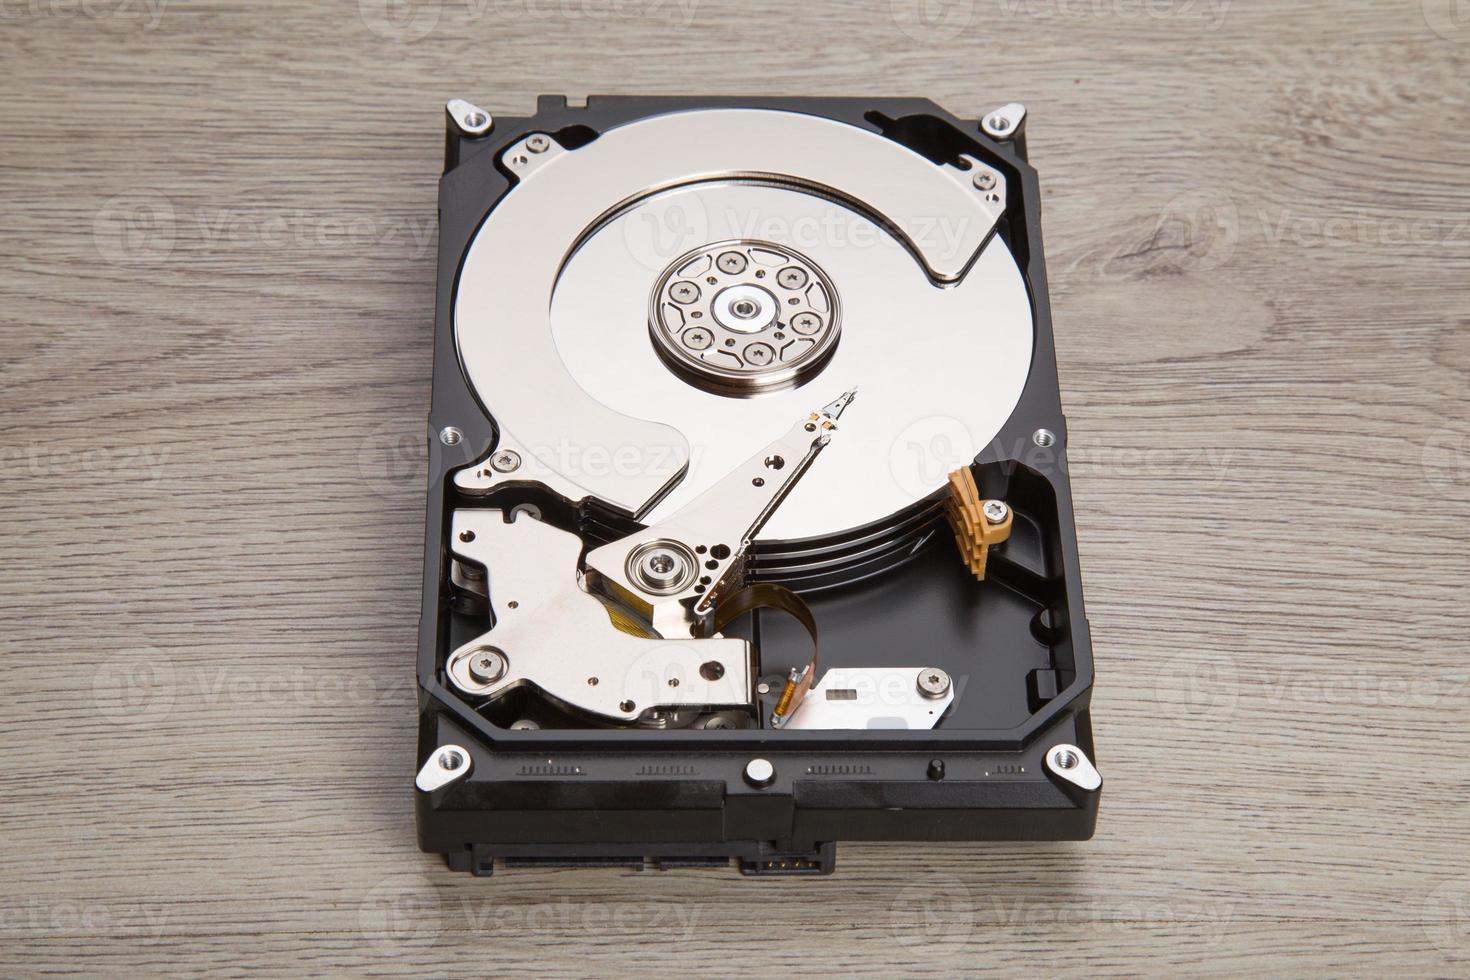 disco rígido aberto na mesa de madeira foto